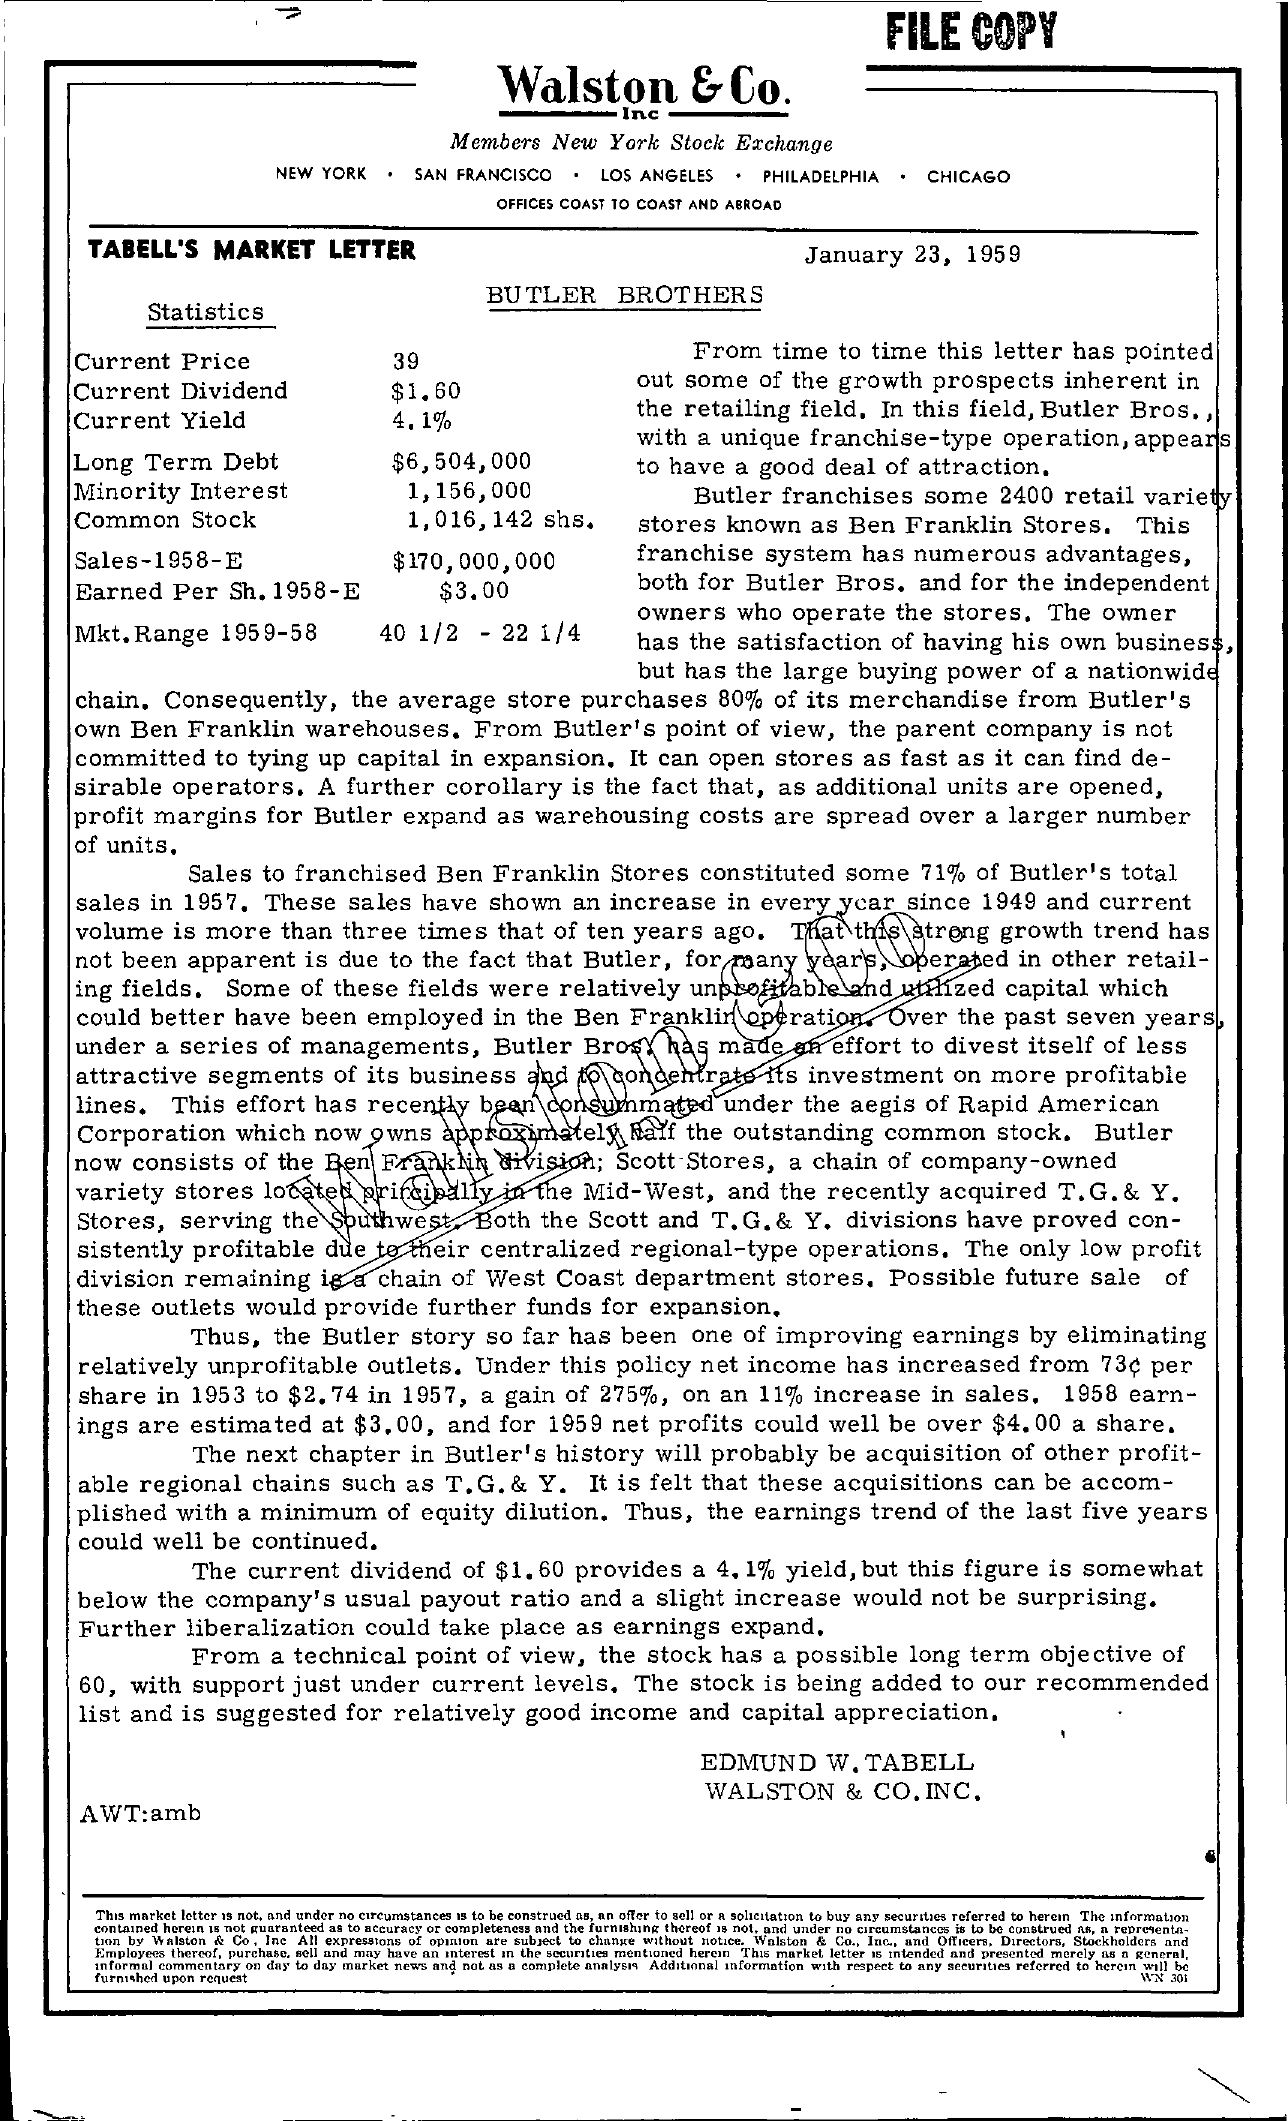 Tabell's Market Letter - January 23, 1959